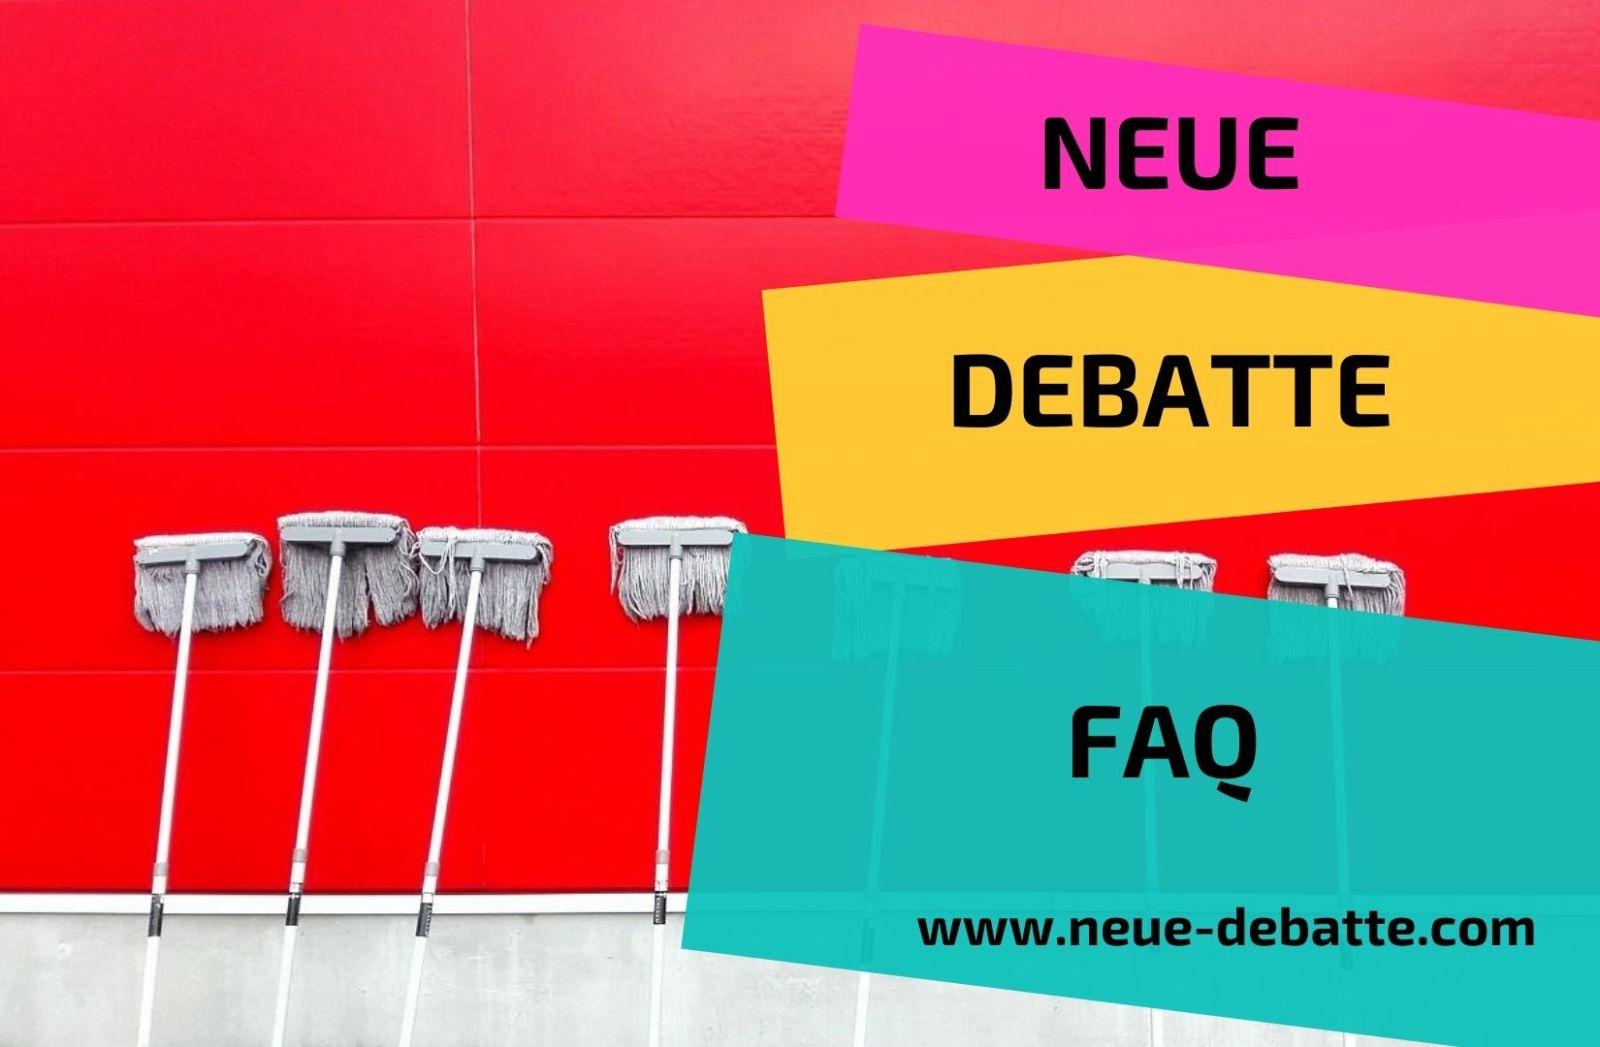 Neue Debatte FAQ